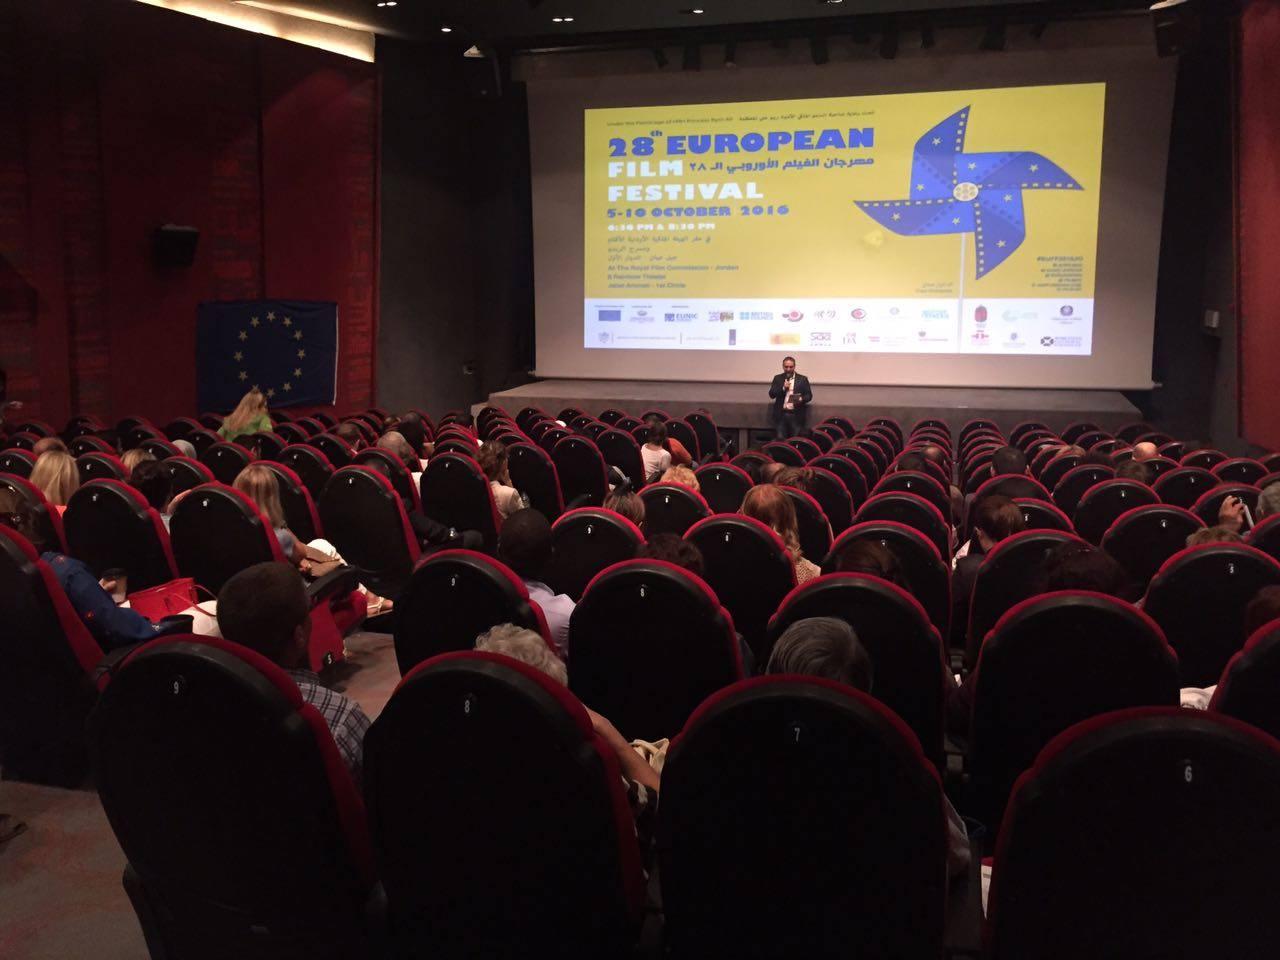 News: Amman hosts European Film Festival